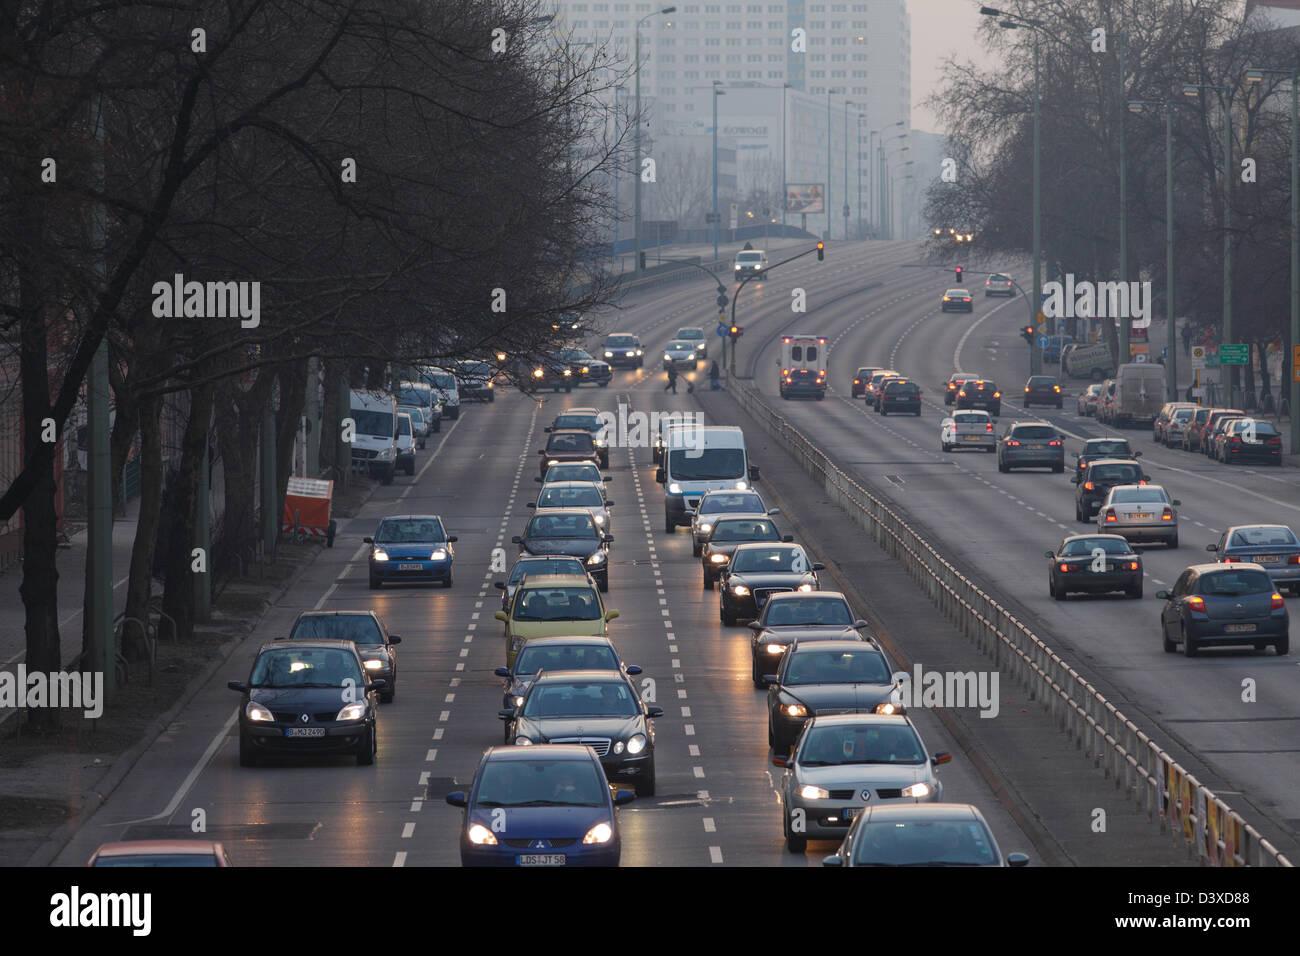 Berlin, Germany, rush-hour traffic on the arterial road in Frankfurter Allee - Stock Image